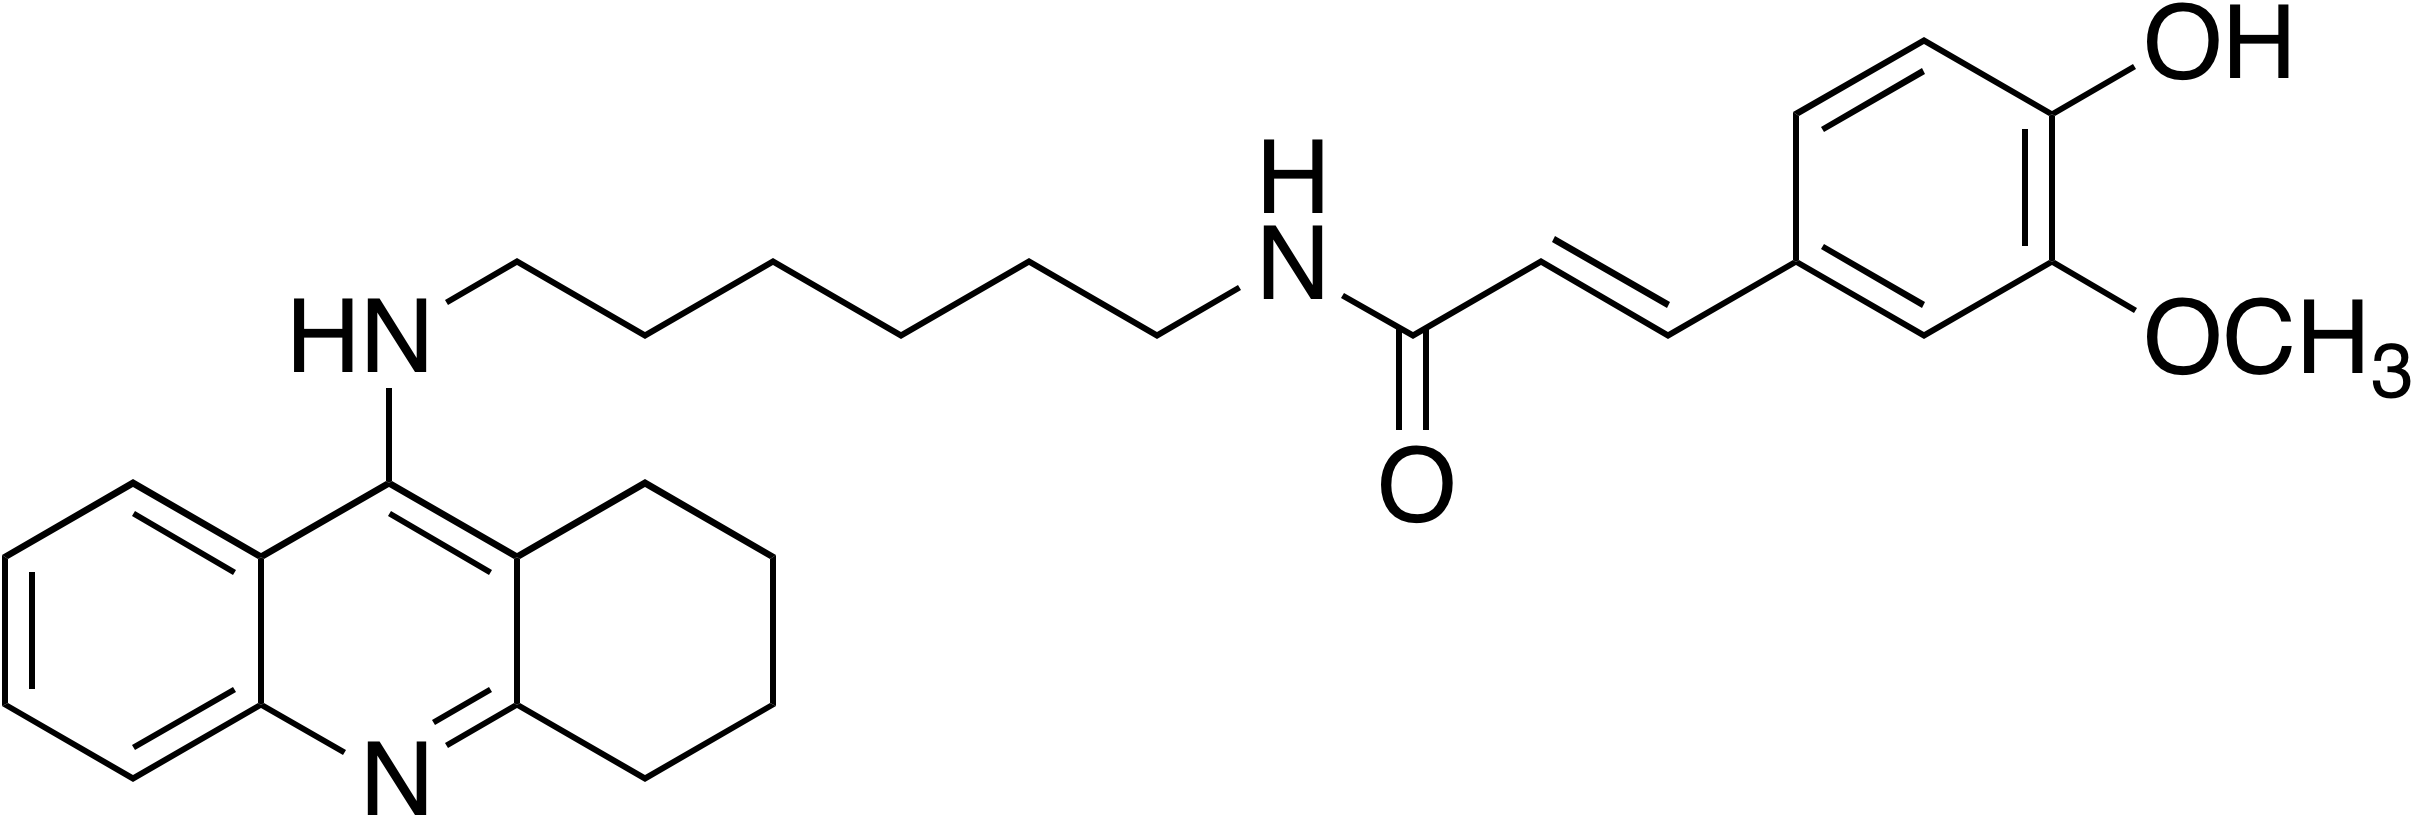 Tacrine-6-ferulic acid